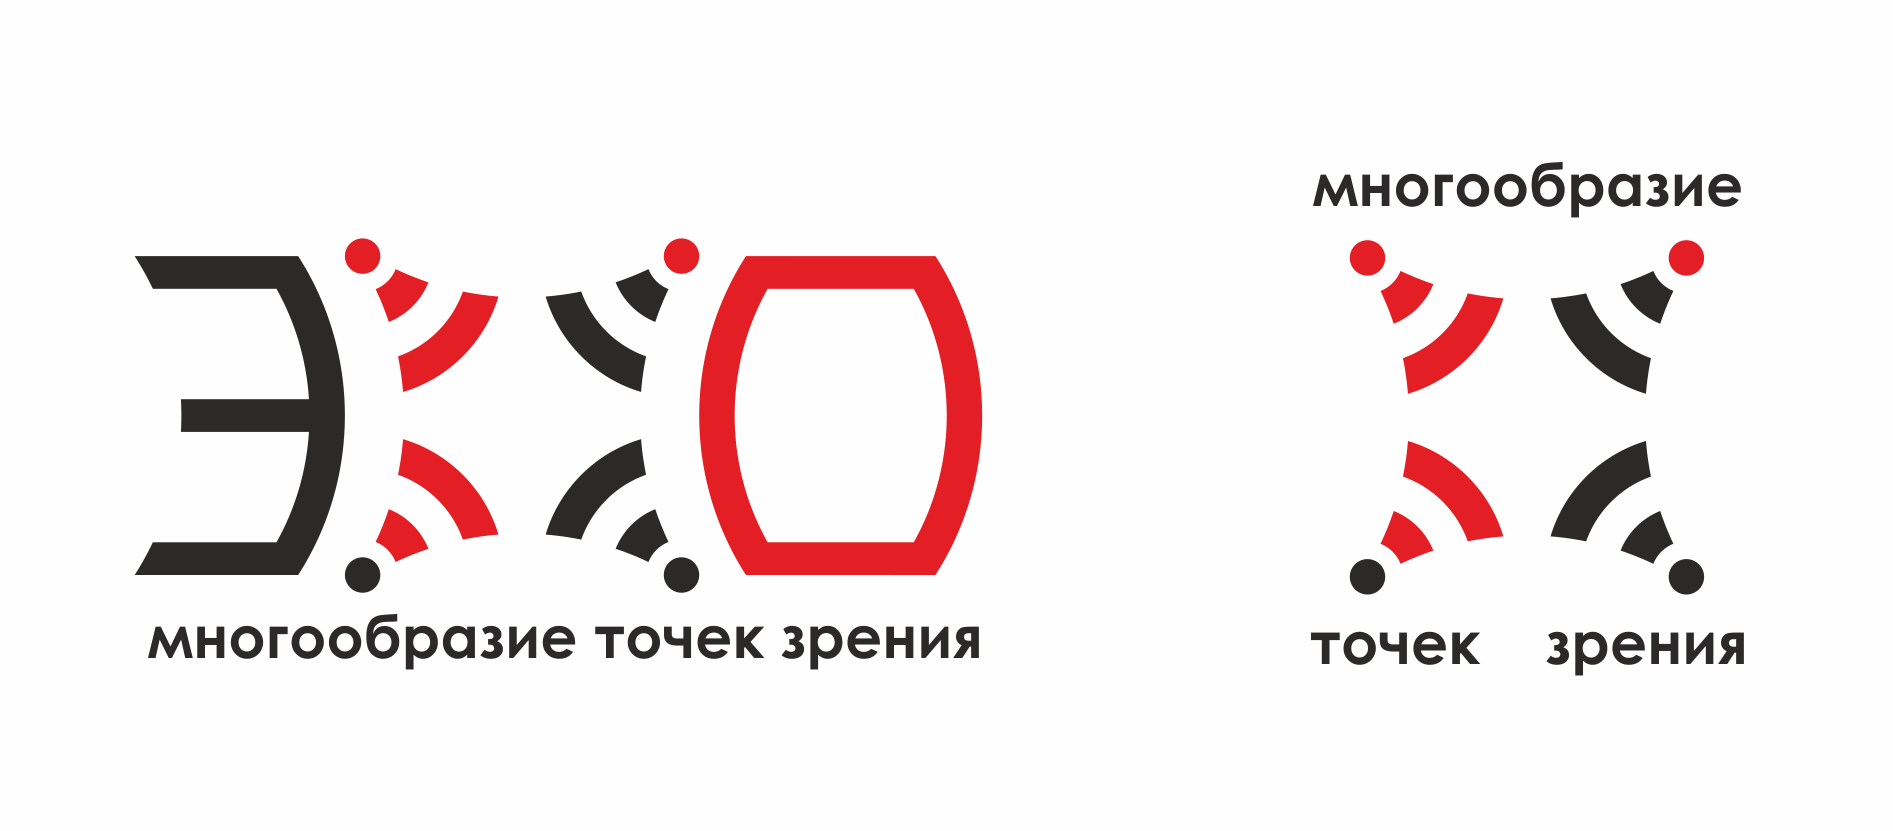 Дизайн логотипа р/с Эхо Москвы. фото f_6785625fac8d59dd.png